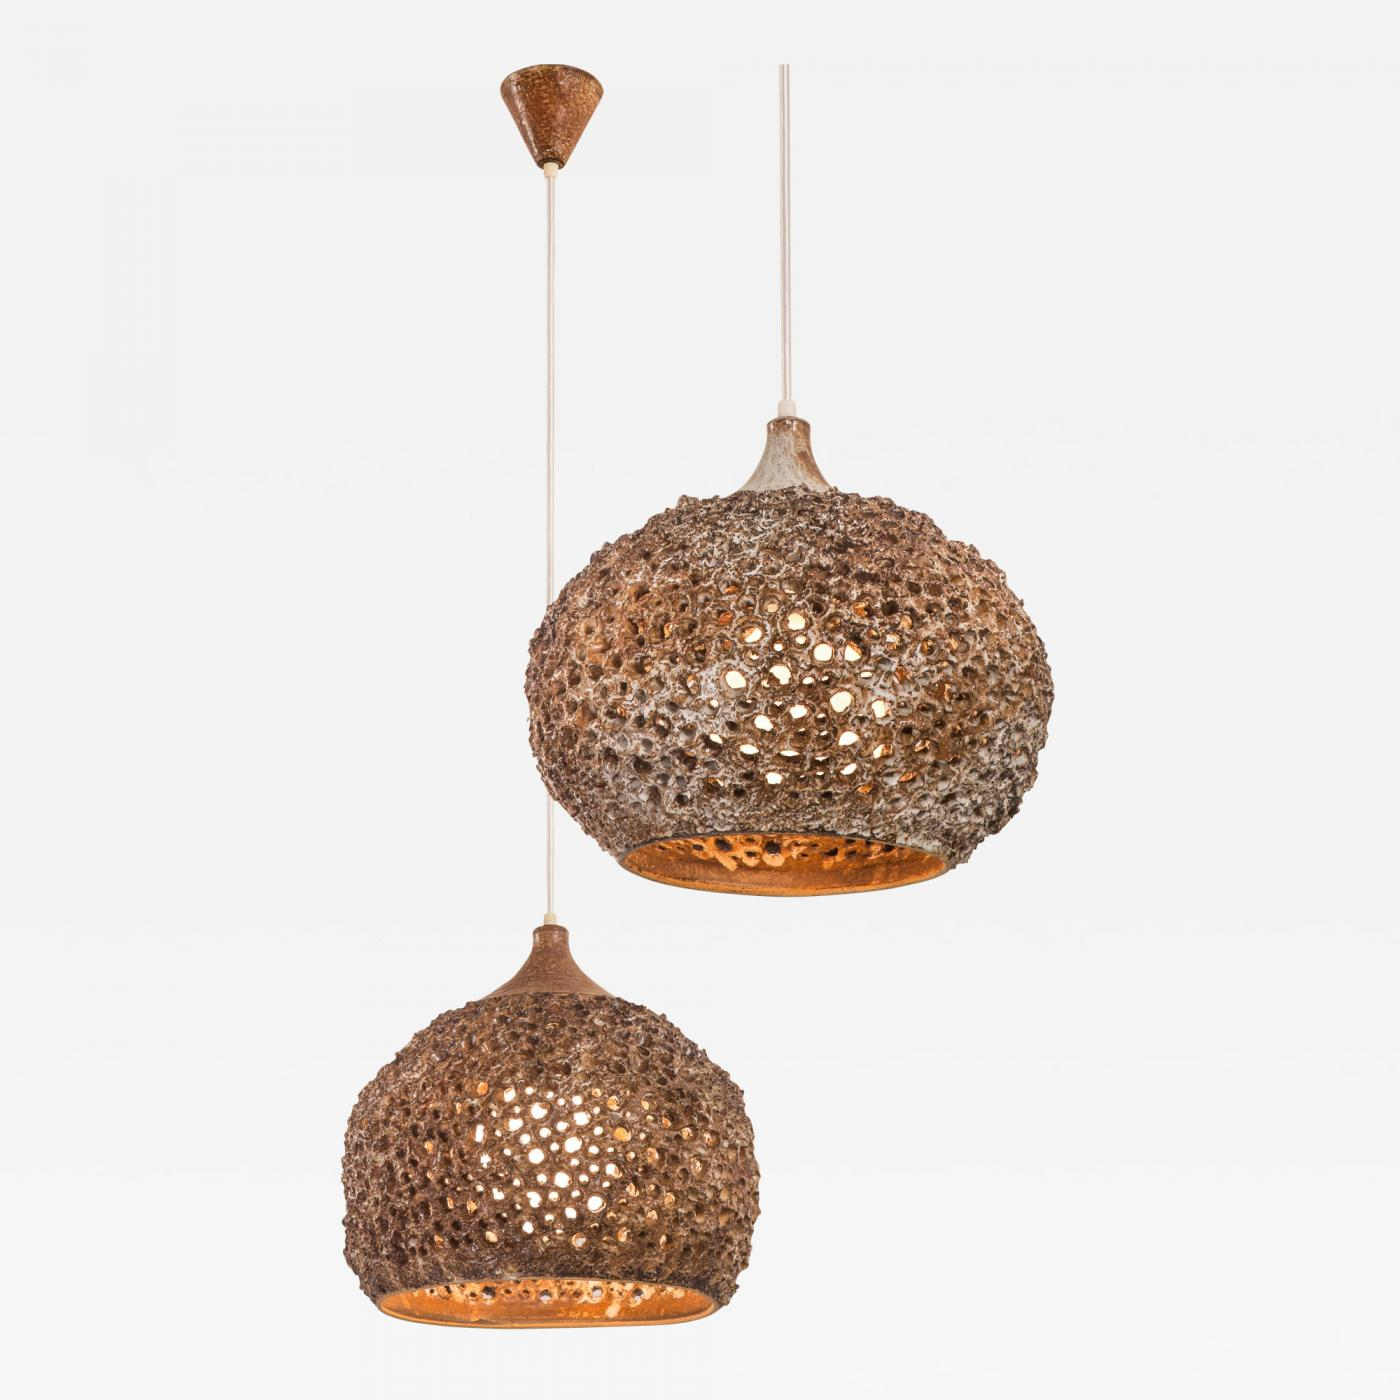 Sejer keramikfabrik sejer keramikfabrik matched pair of danish listings furniture lighting chandeliers and pendants arubaitofo Choice Image